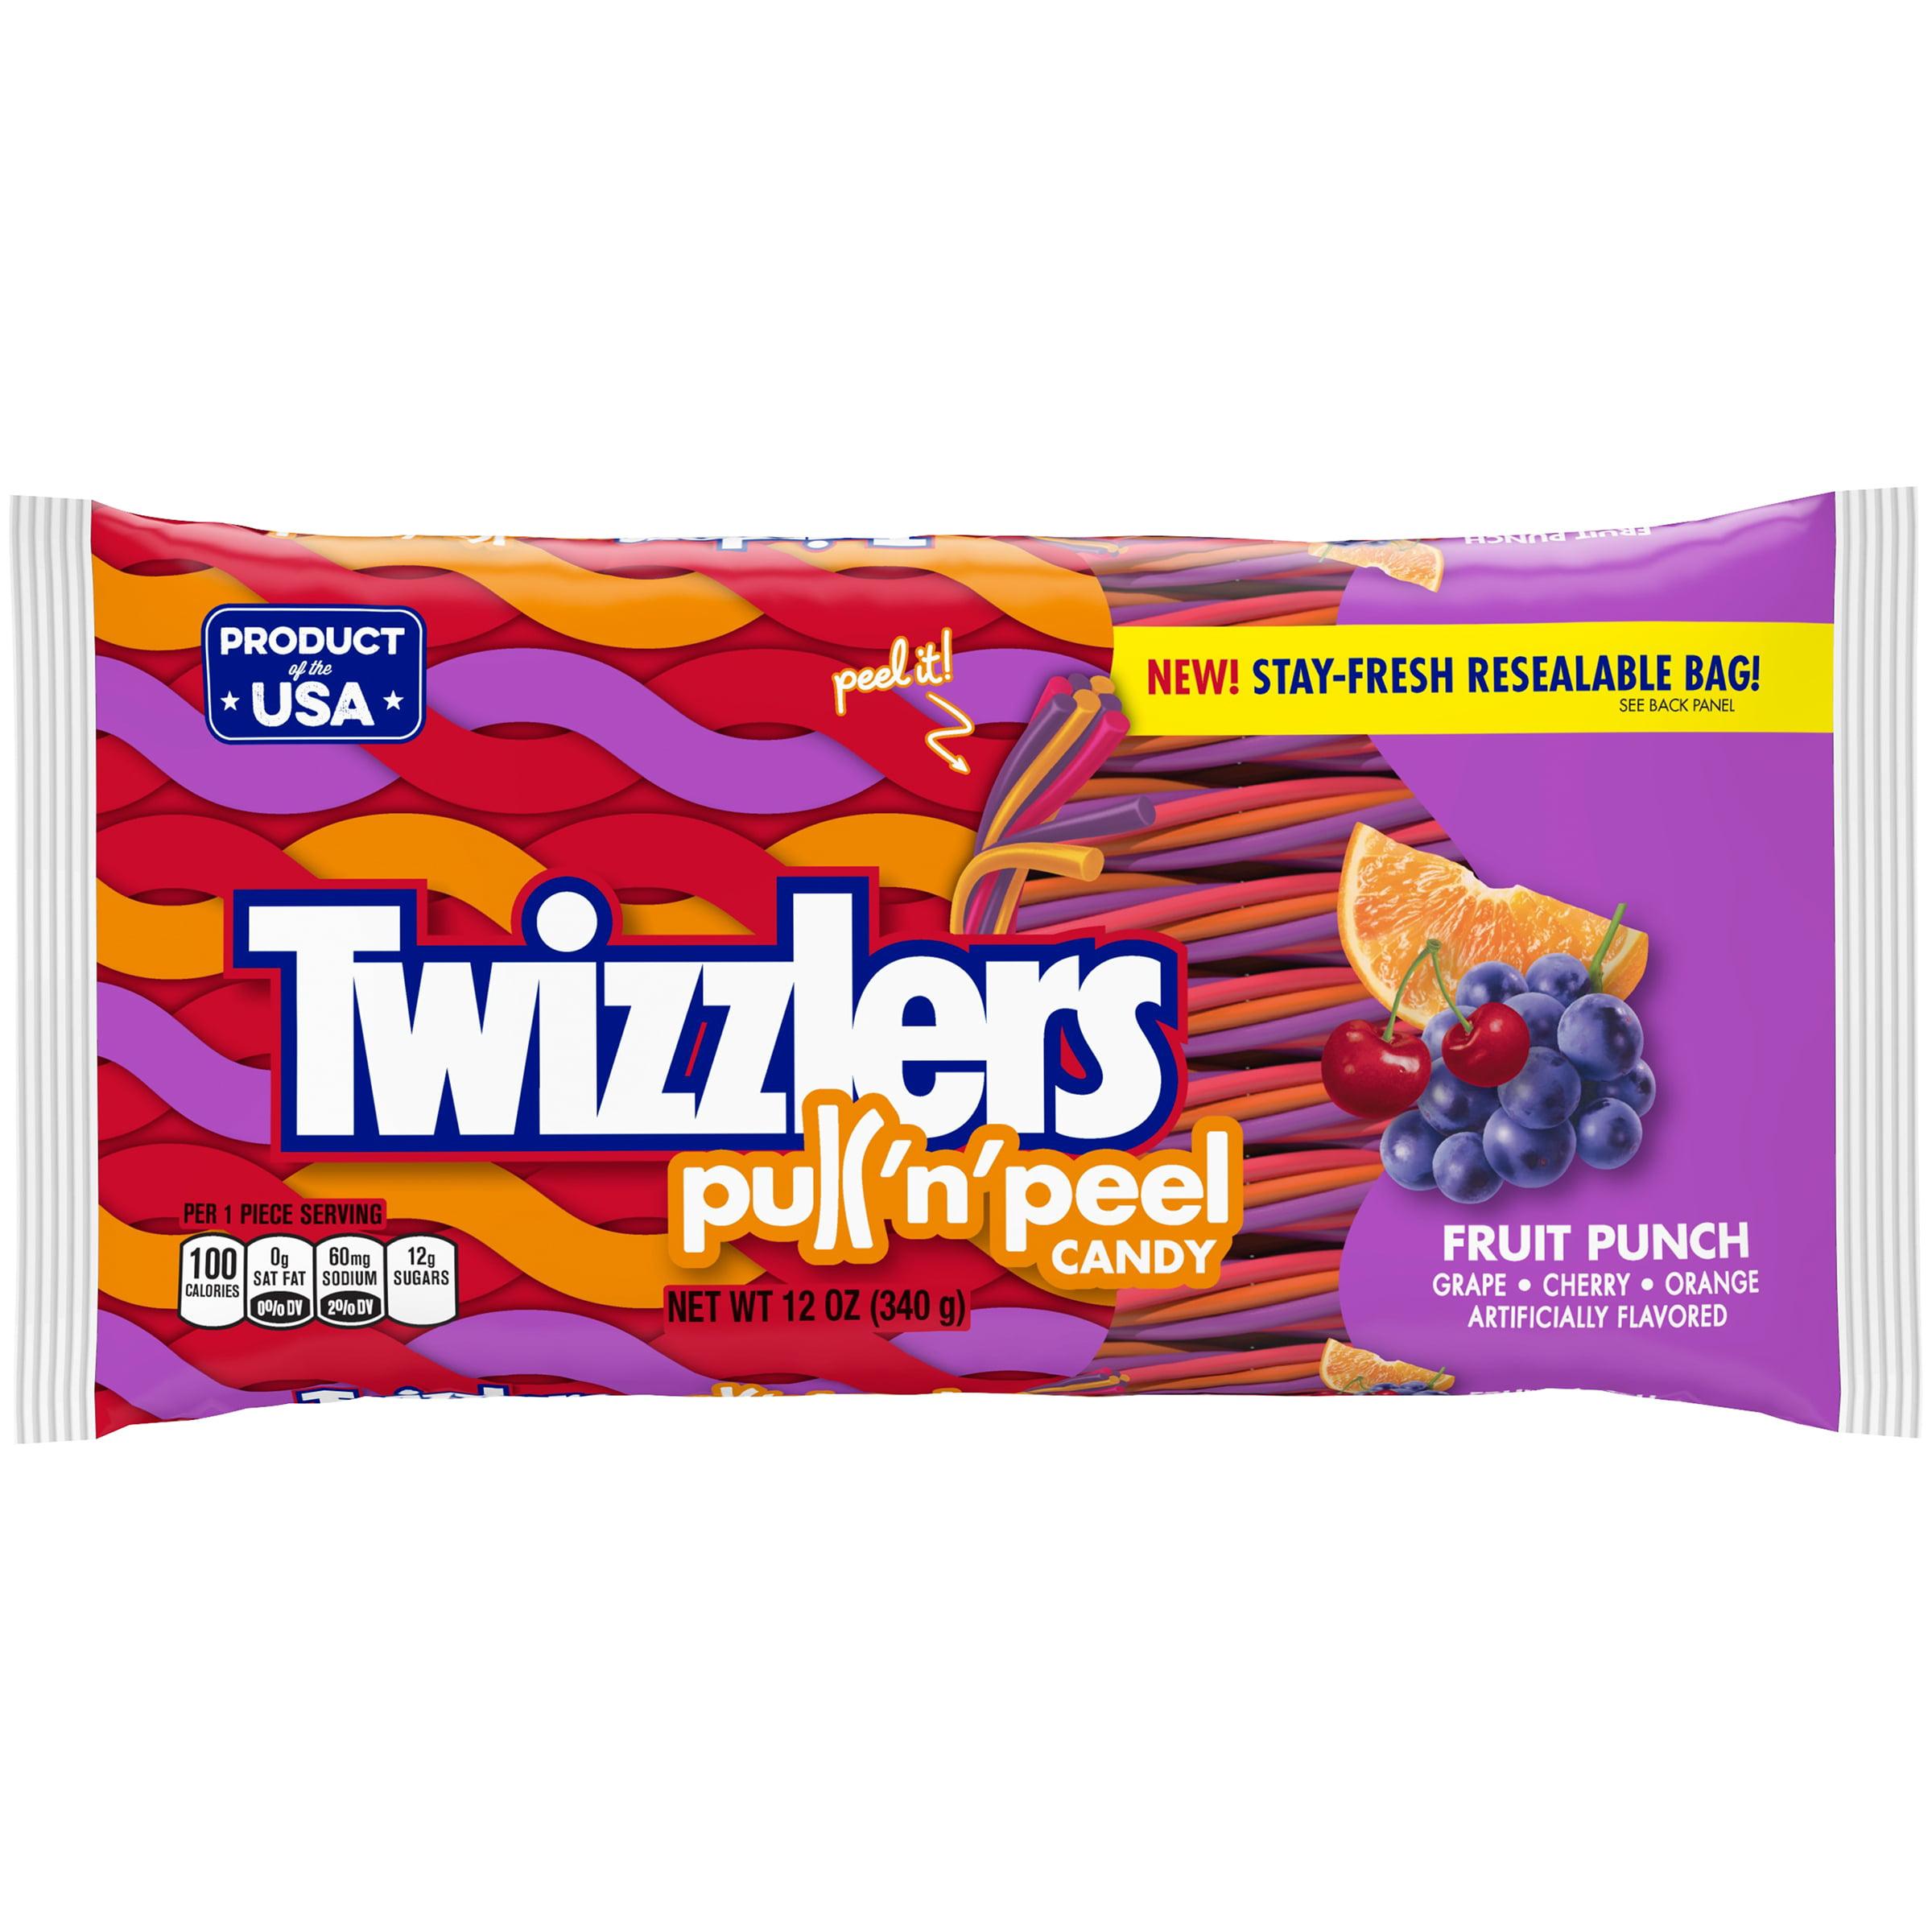 Hershey Foods TWIZZLERS PULL 'N' PEEL Fruit Punch Candy, 12 oz